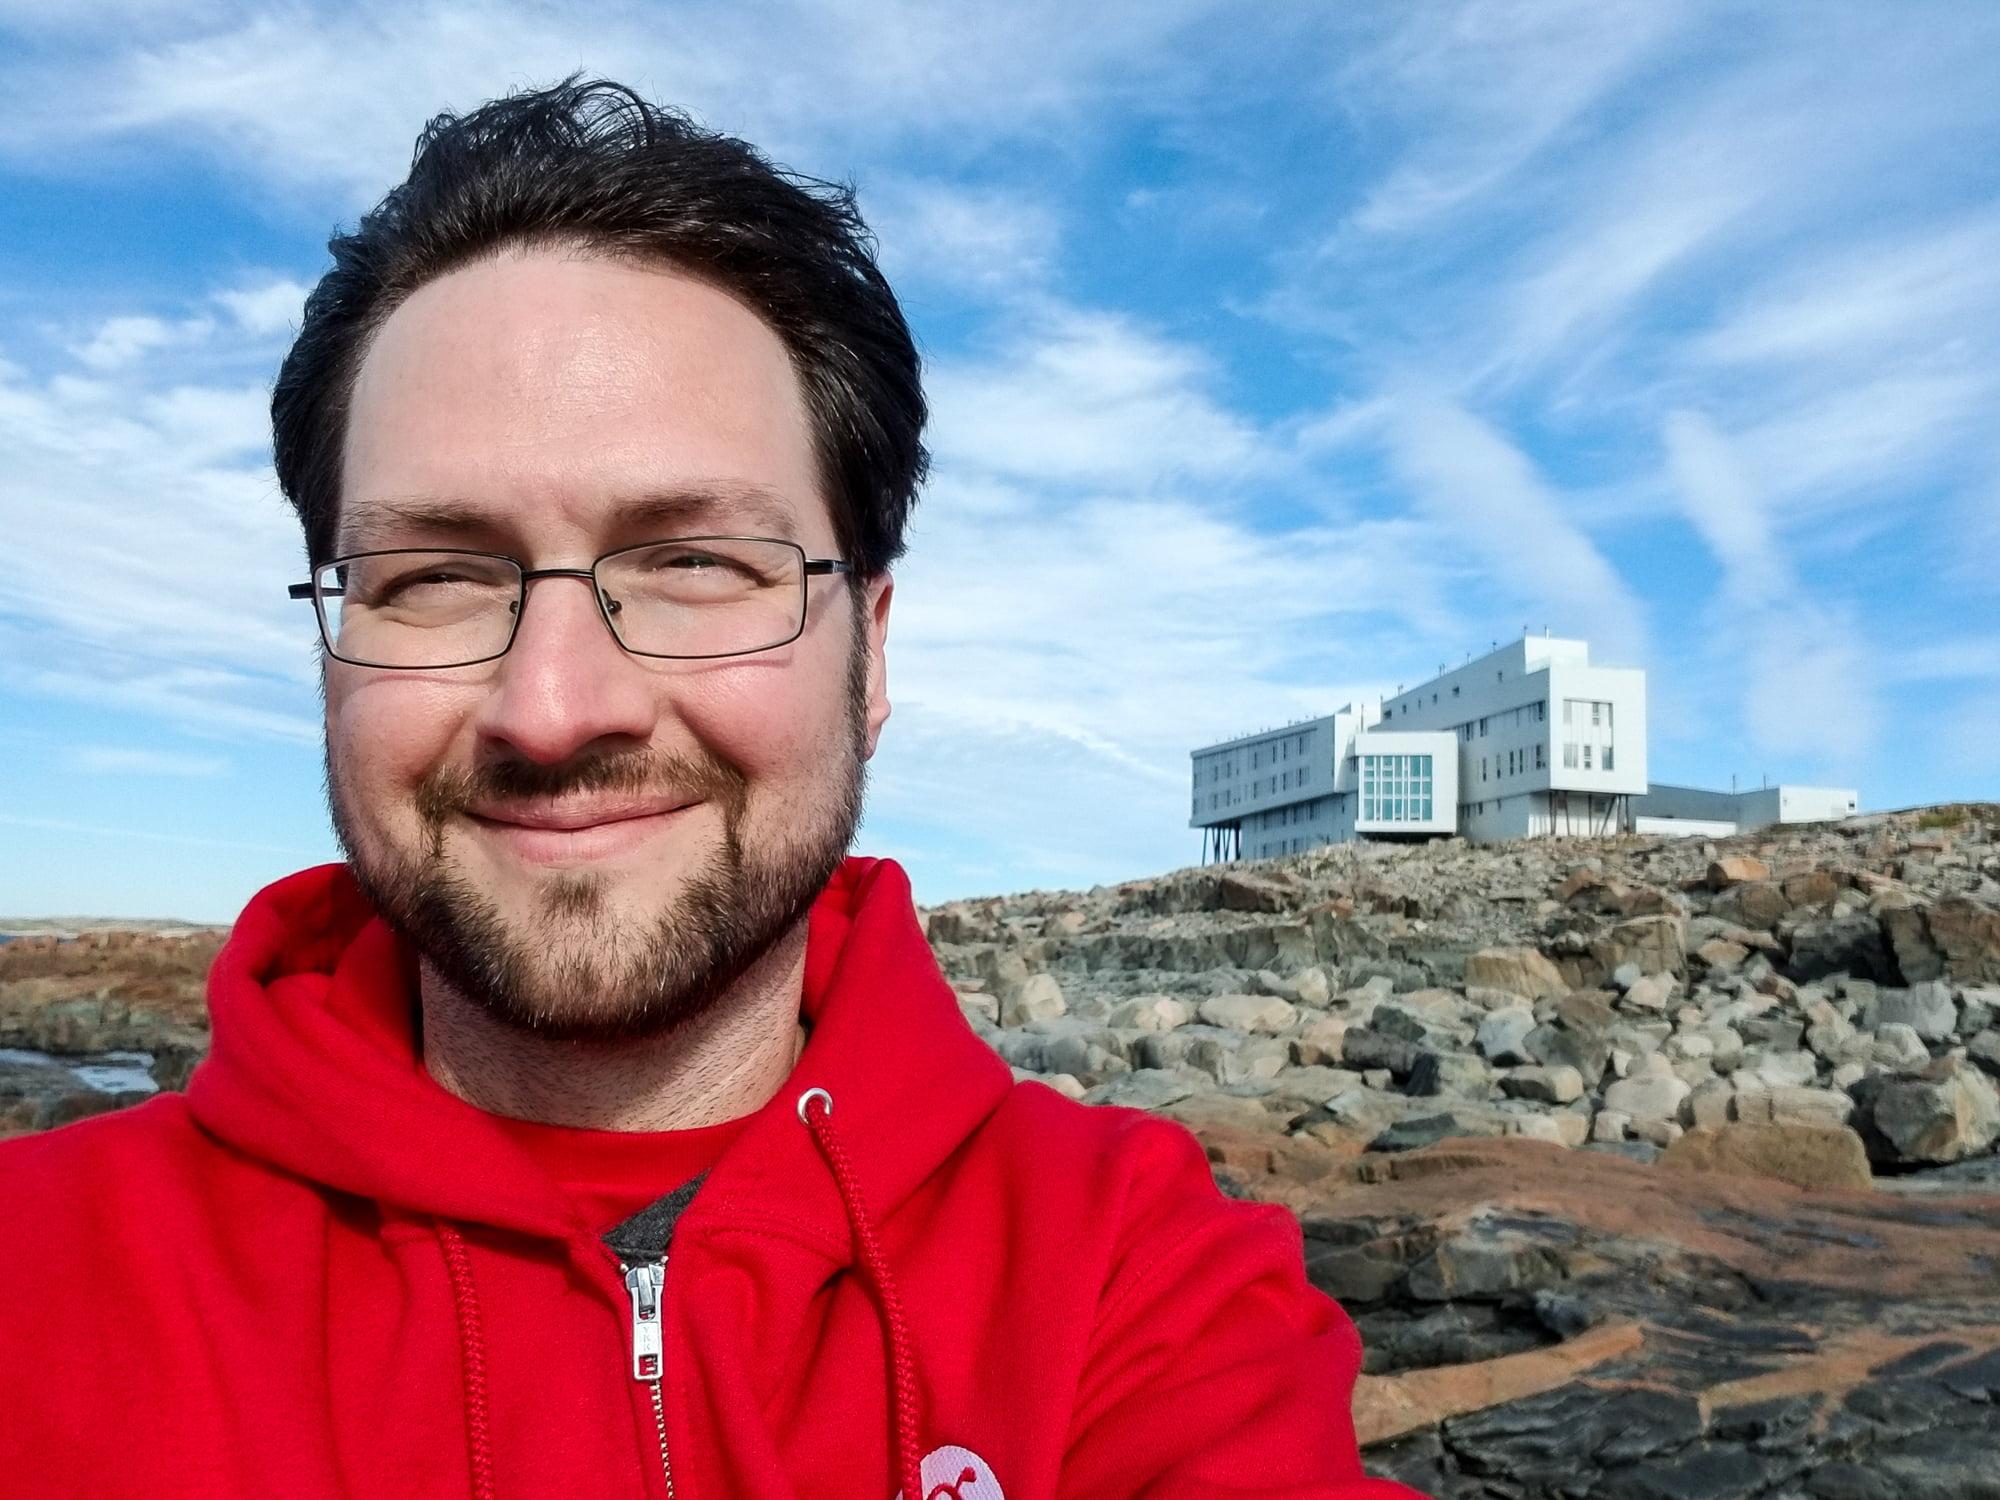 Selfie at Fogo Island Inn | Samsung Galaxy Note 8